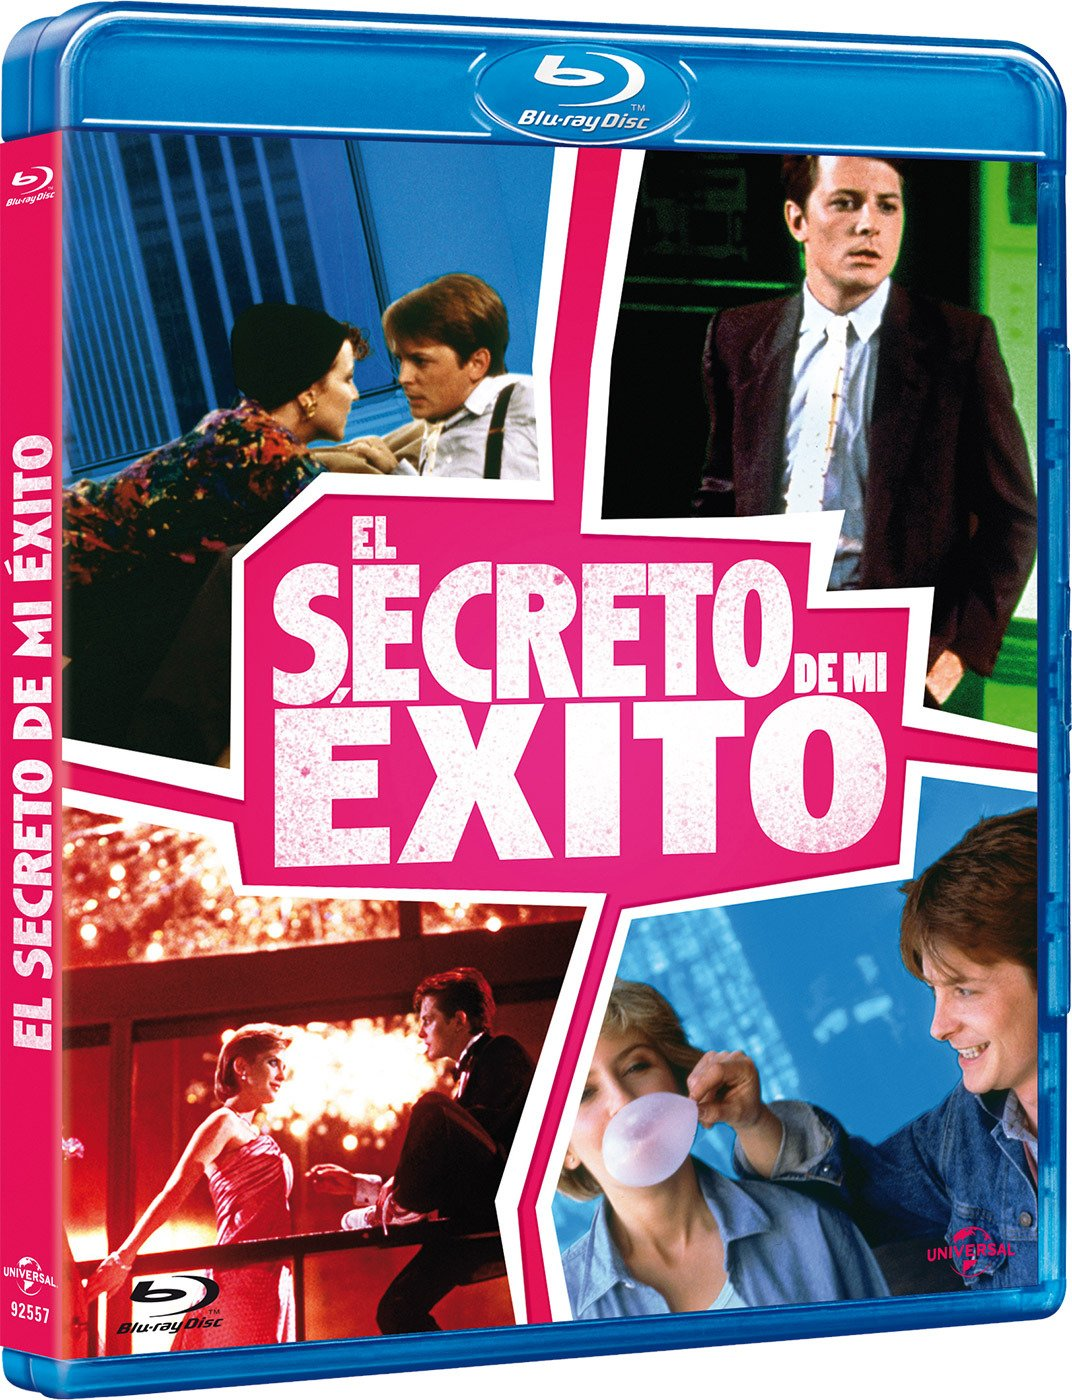 El Secreto De Mi Éxito [Blu-ray]: Amazon.es: Michael J. Fox, Helen Slater, Richard Jordan, Herbert Ross, Michael J. Fox, Helen Slater, Herbert Ross: Cine y Series TV